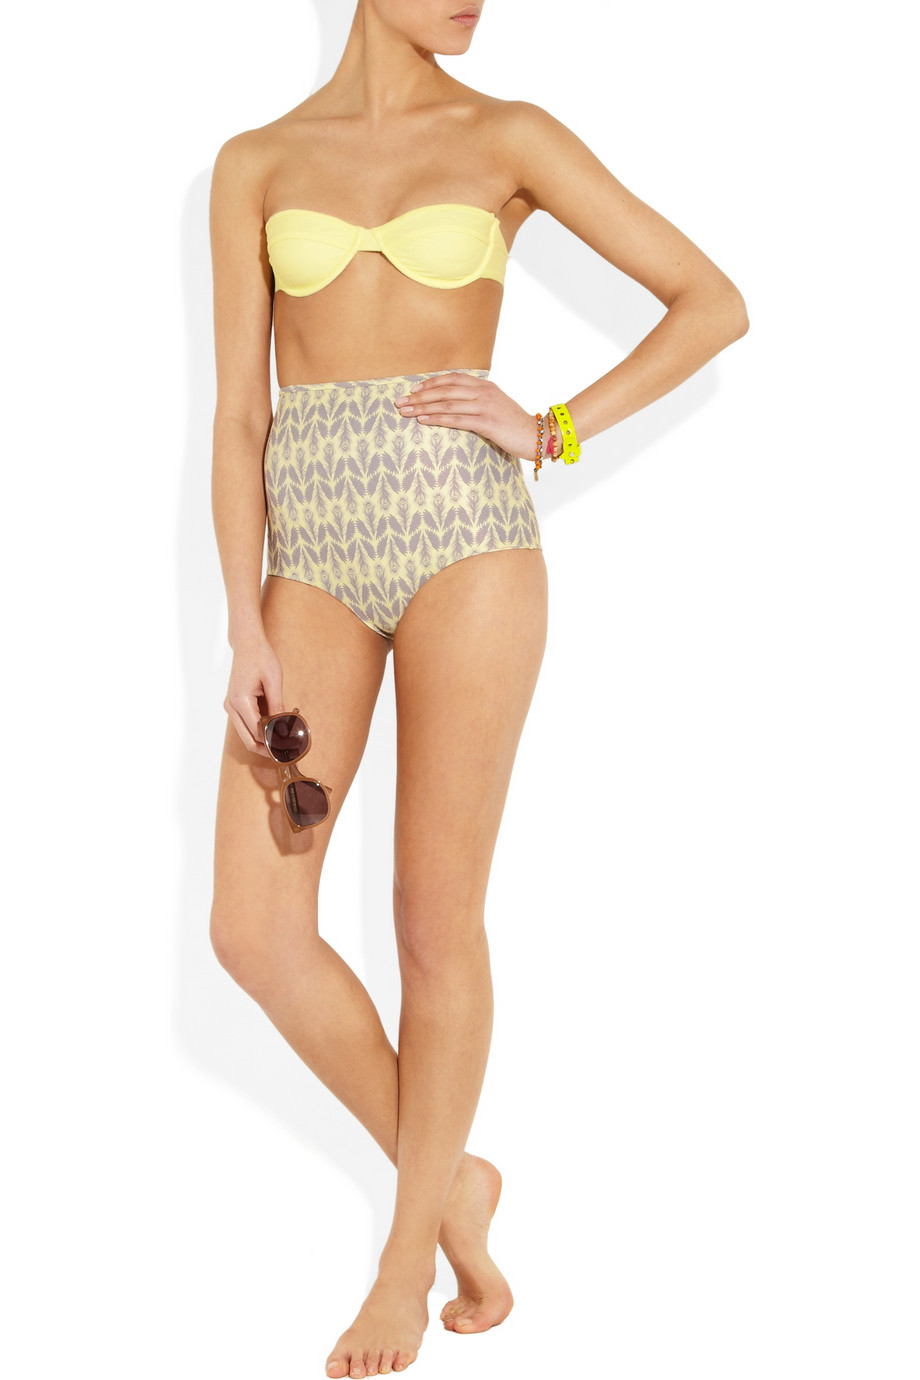 Tori praver kenny underwired bikini top